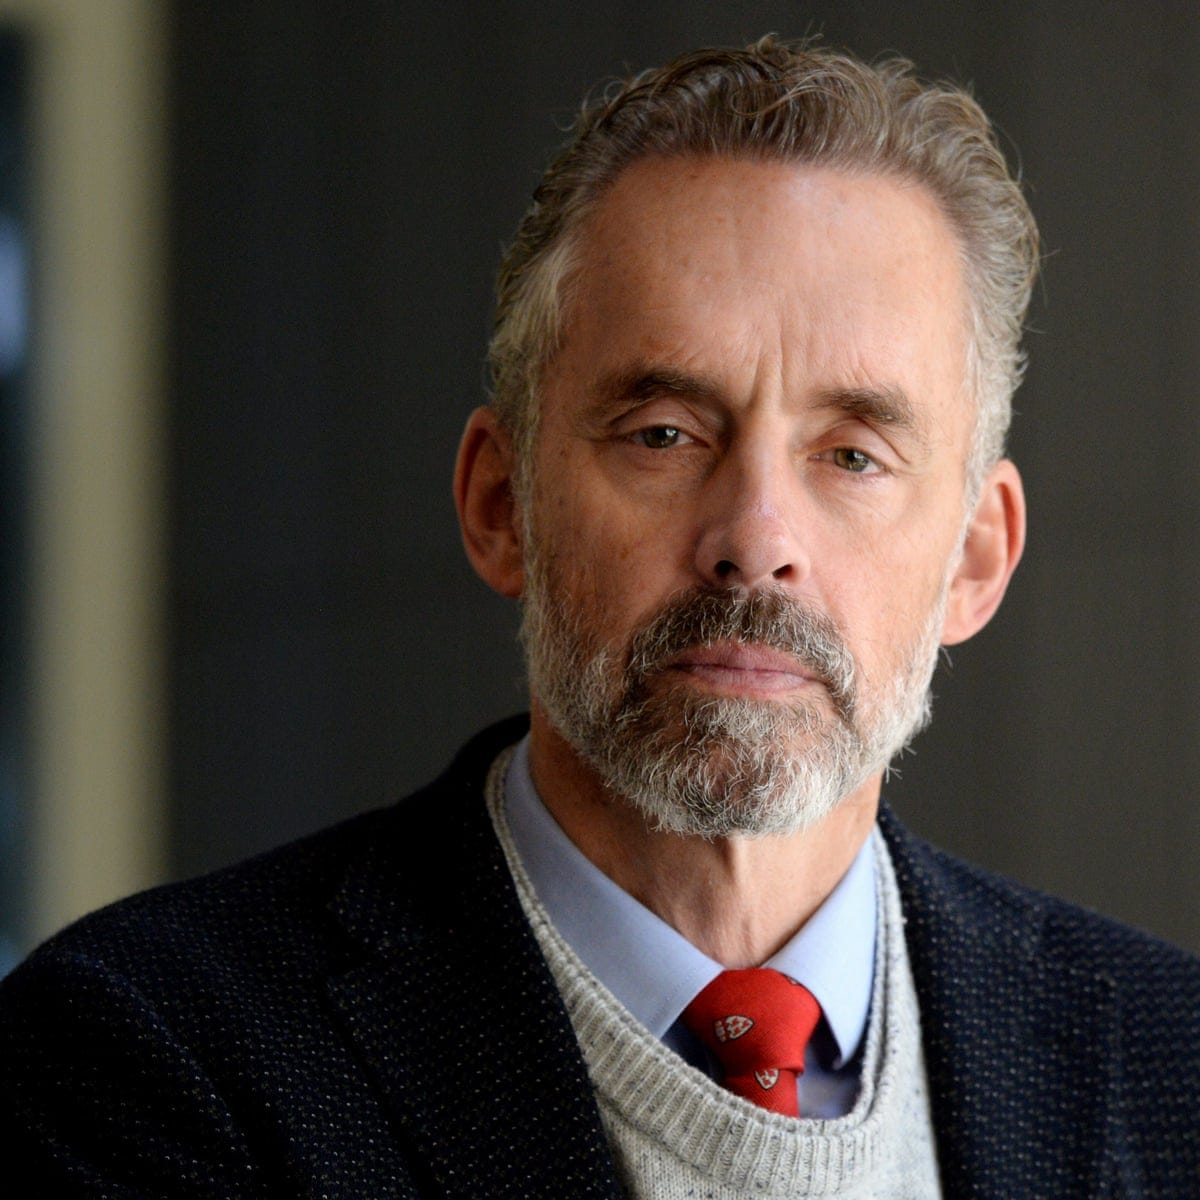 Jordan Peterson launches anti-censorship site Thinkspot | Internet ...